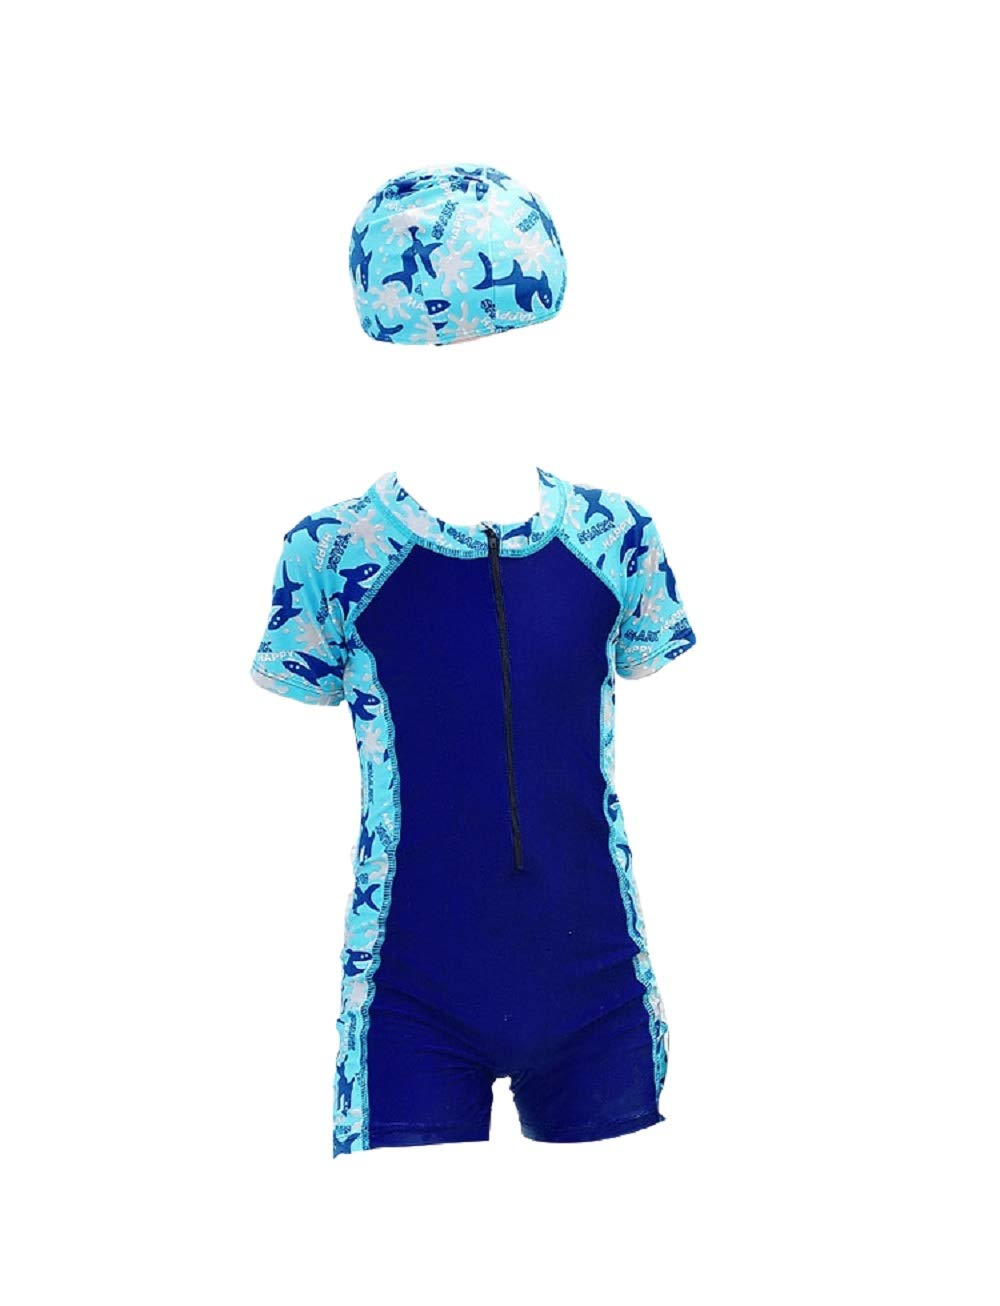 Yunqir Kids Wetsuit 2 Pcs Children's Short One Piece Swimsuits Kids Whales Patterns Sunscreen Wetsuit for Water Sports(Dark-Blue)